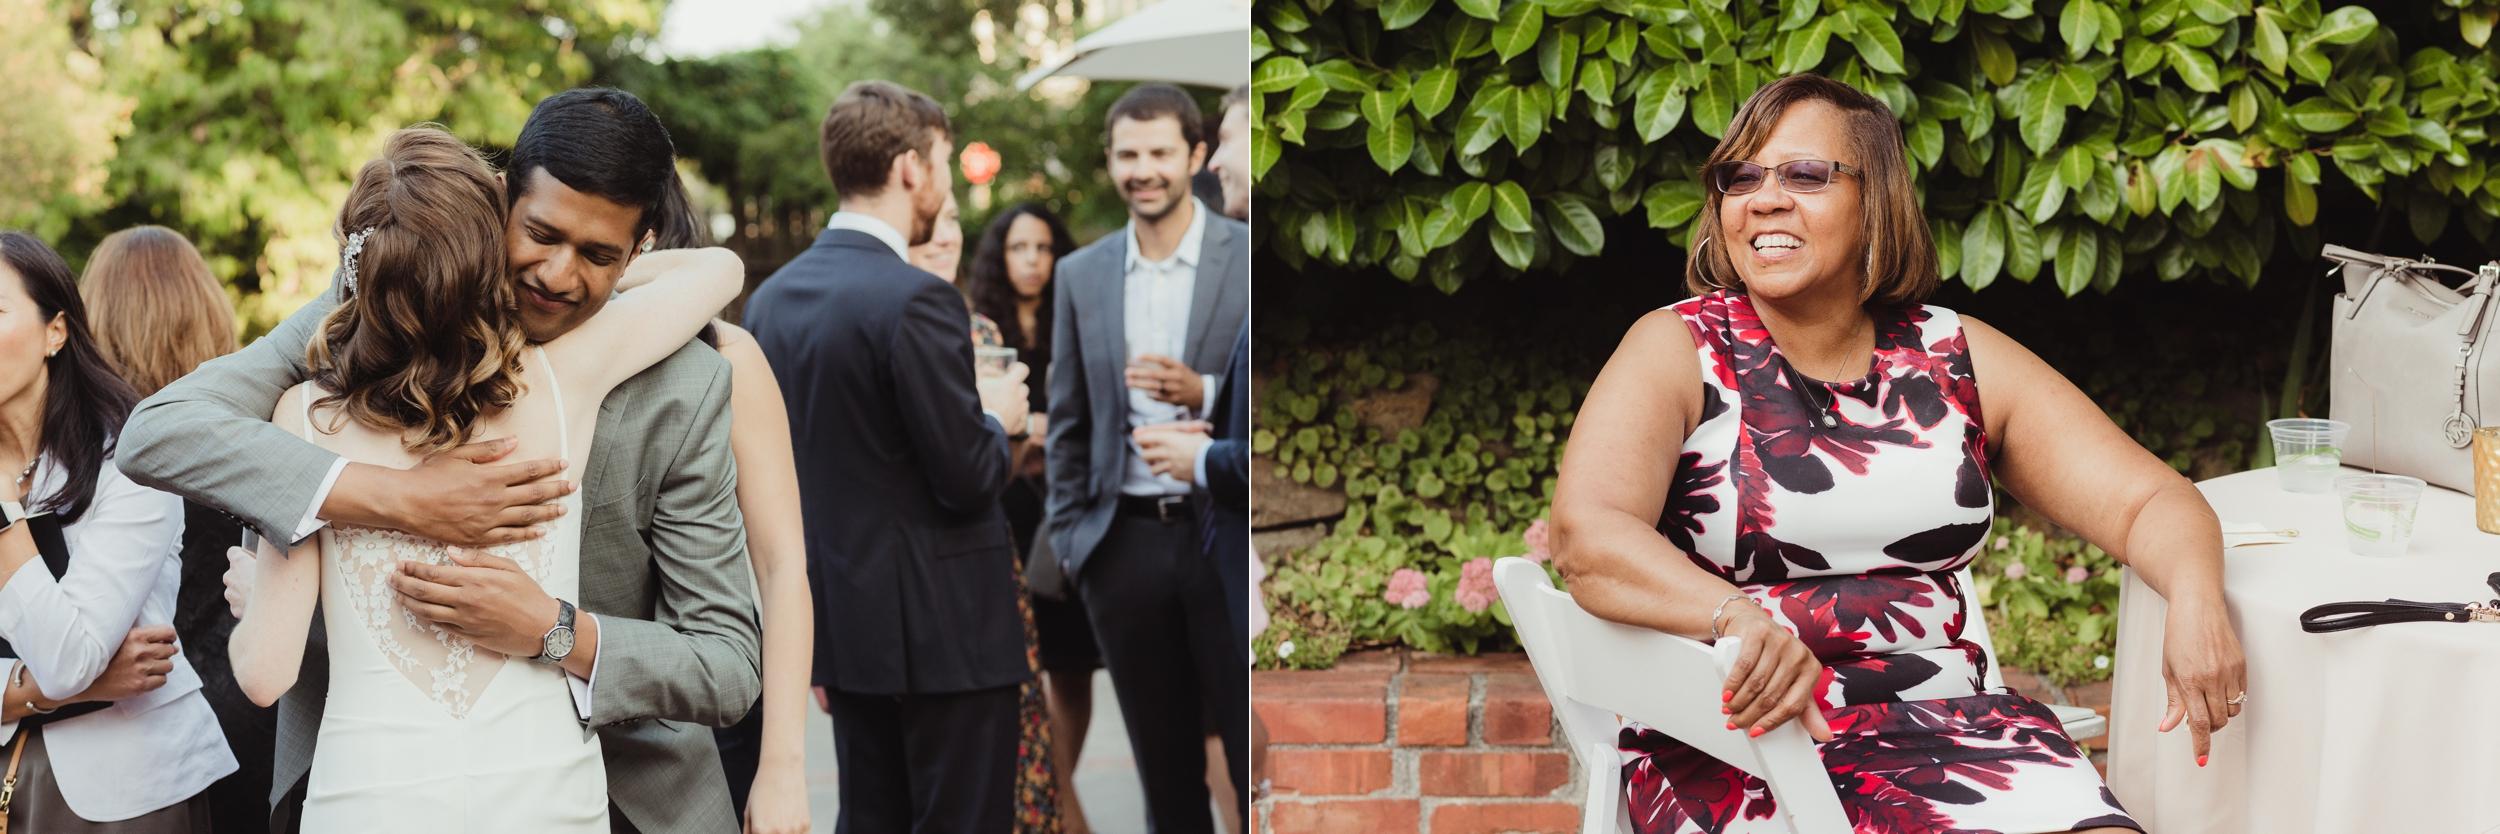 52-outdoor-art-club-wedding-vivianchen-526_WEB.jpg